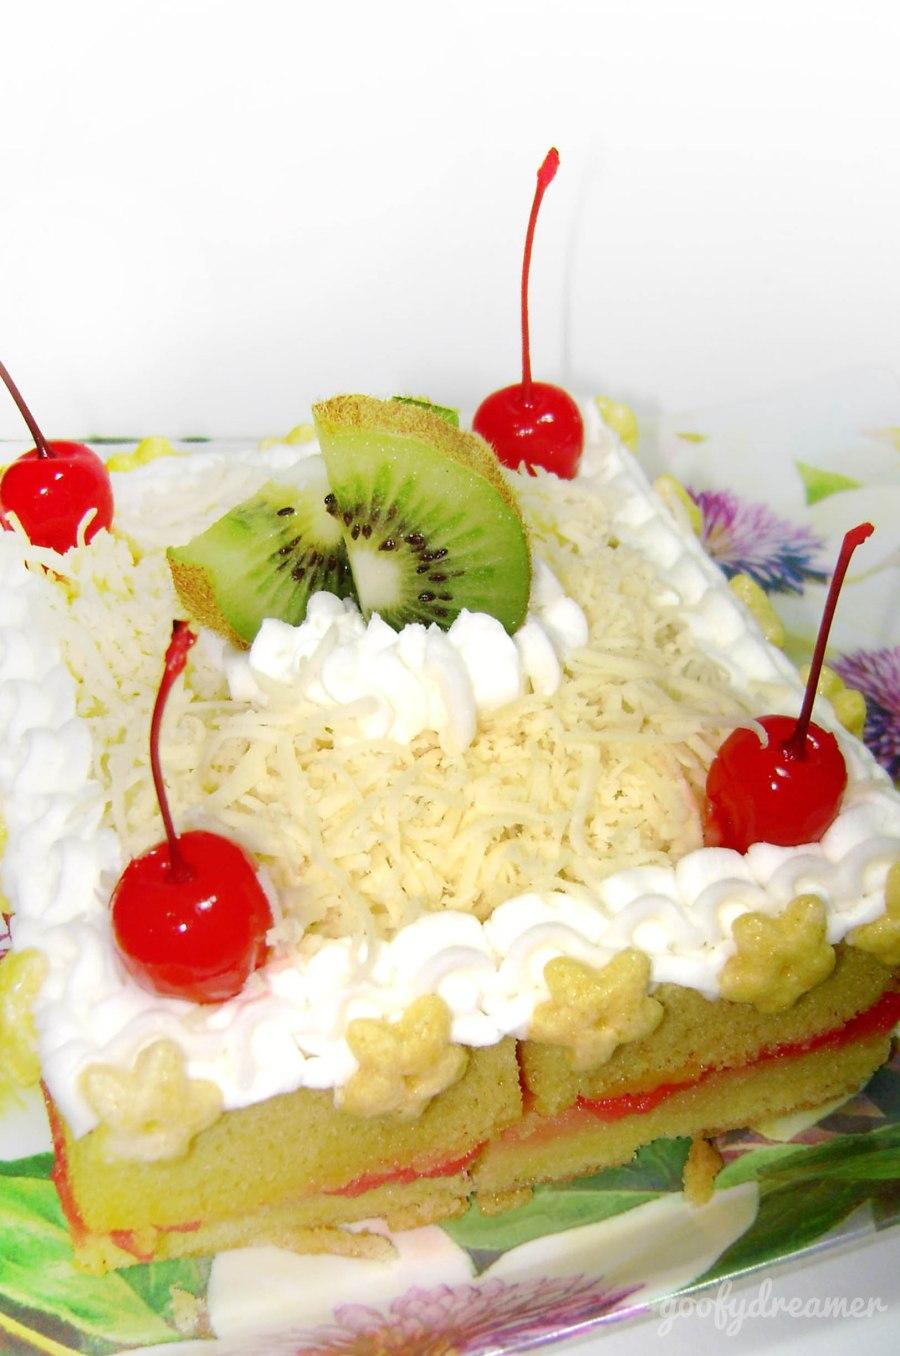 Eh kira-kira Sinyo ingat kue ini?